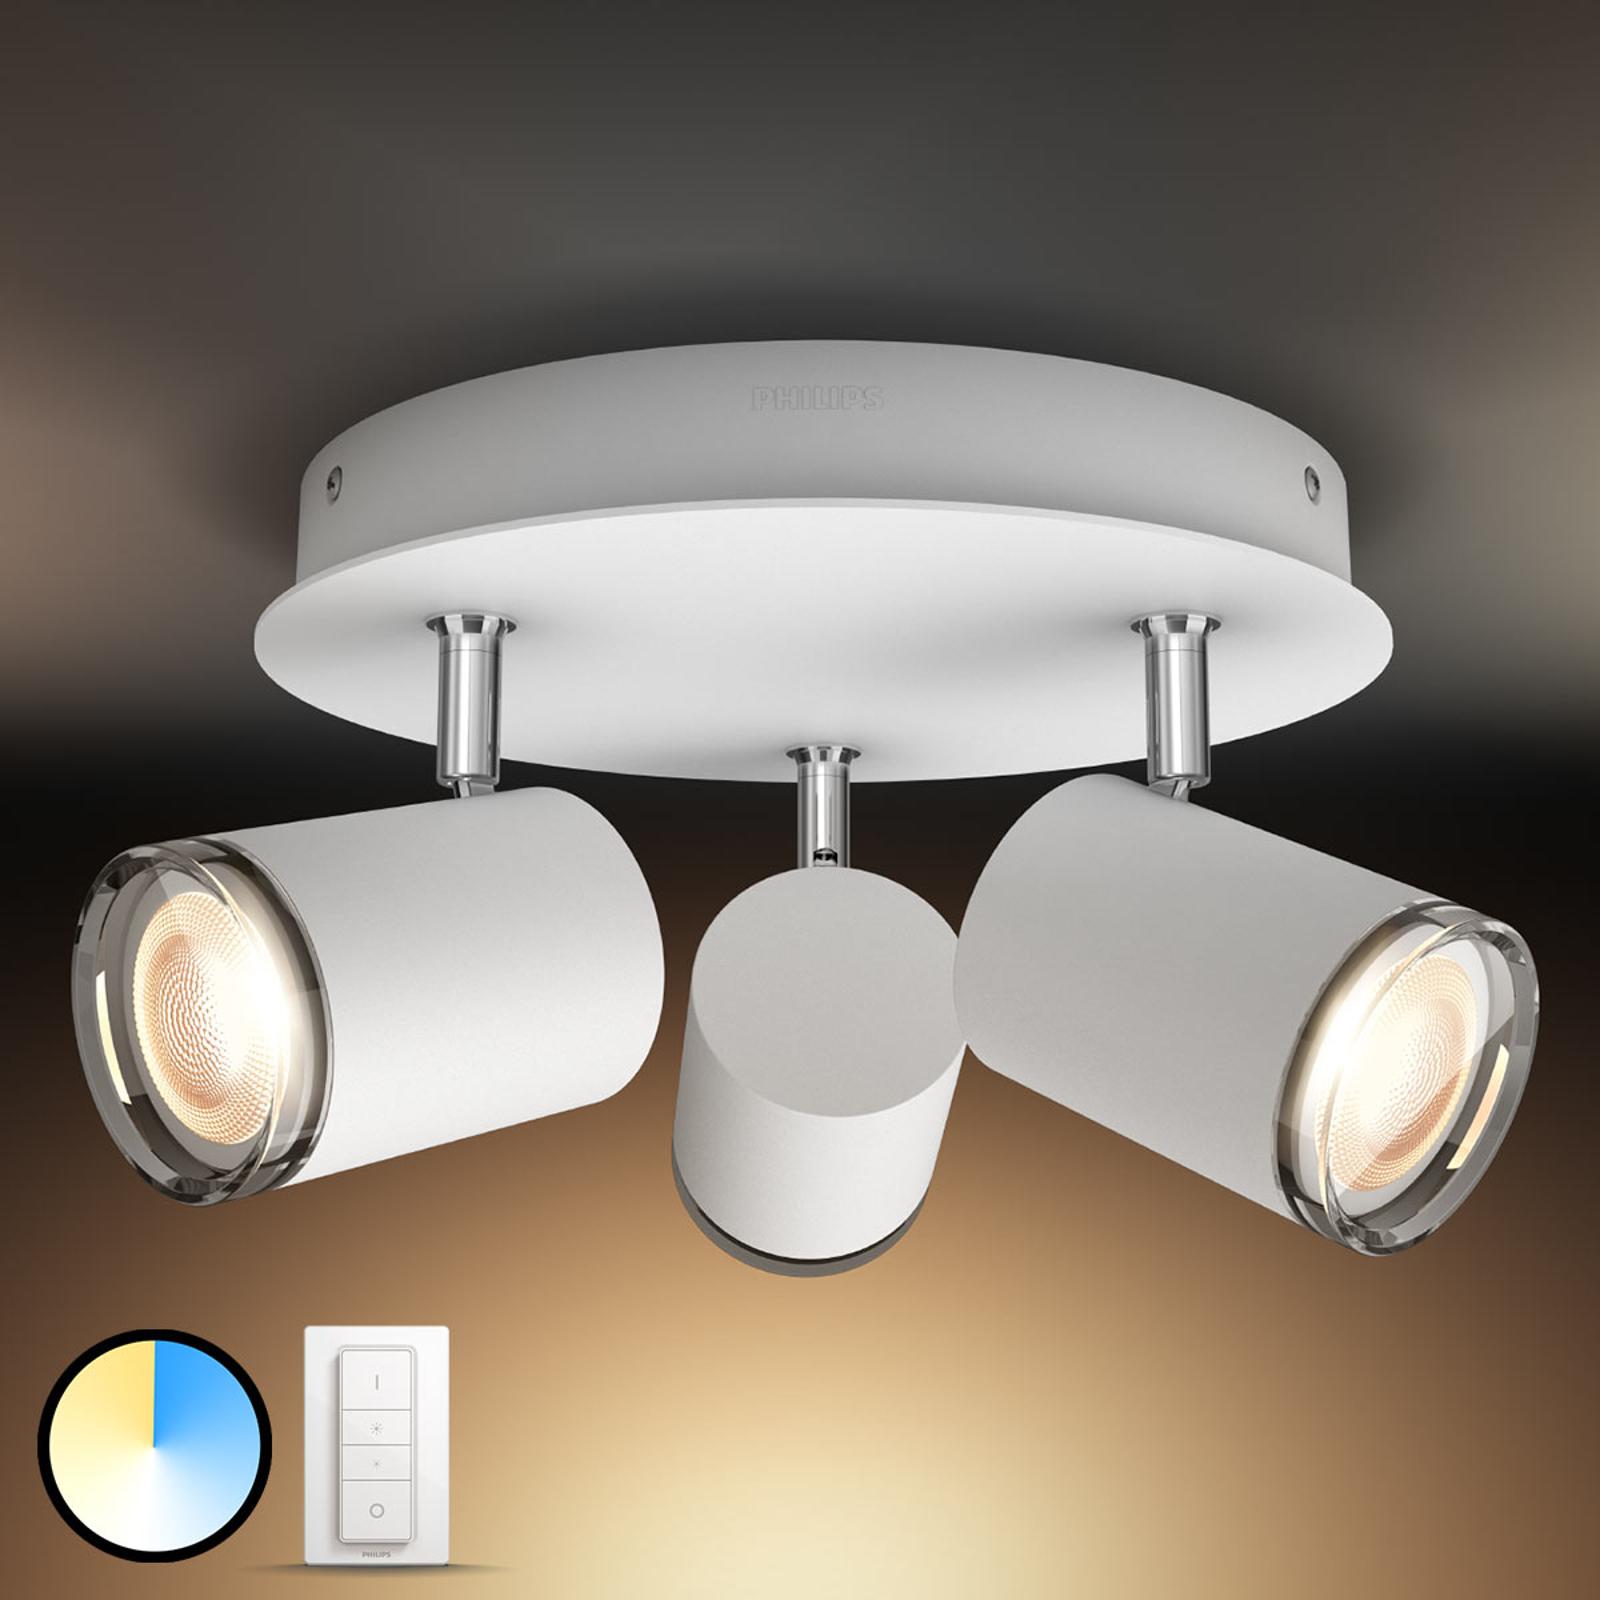 Philips Hue White Ambiance Adore Led Plafondlamp Lampen24 Nl